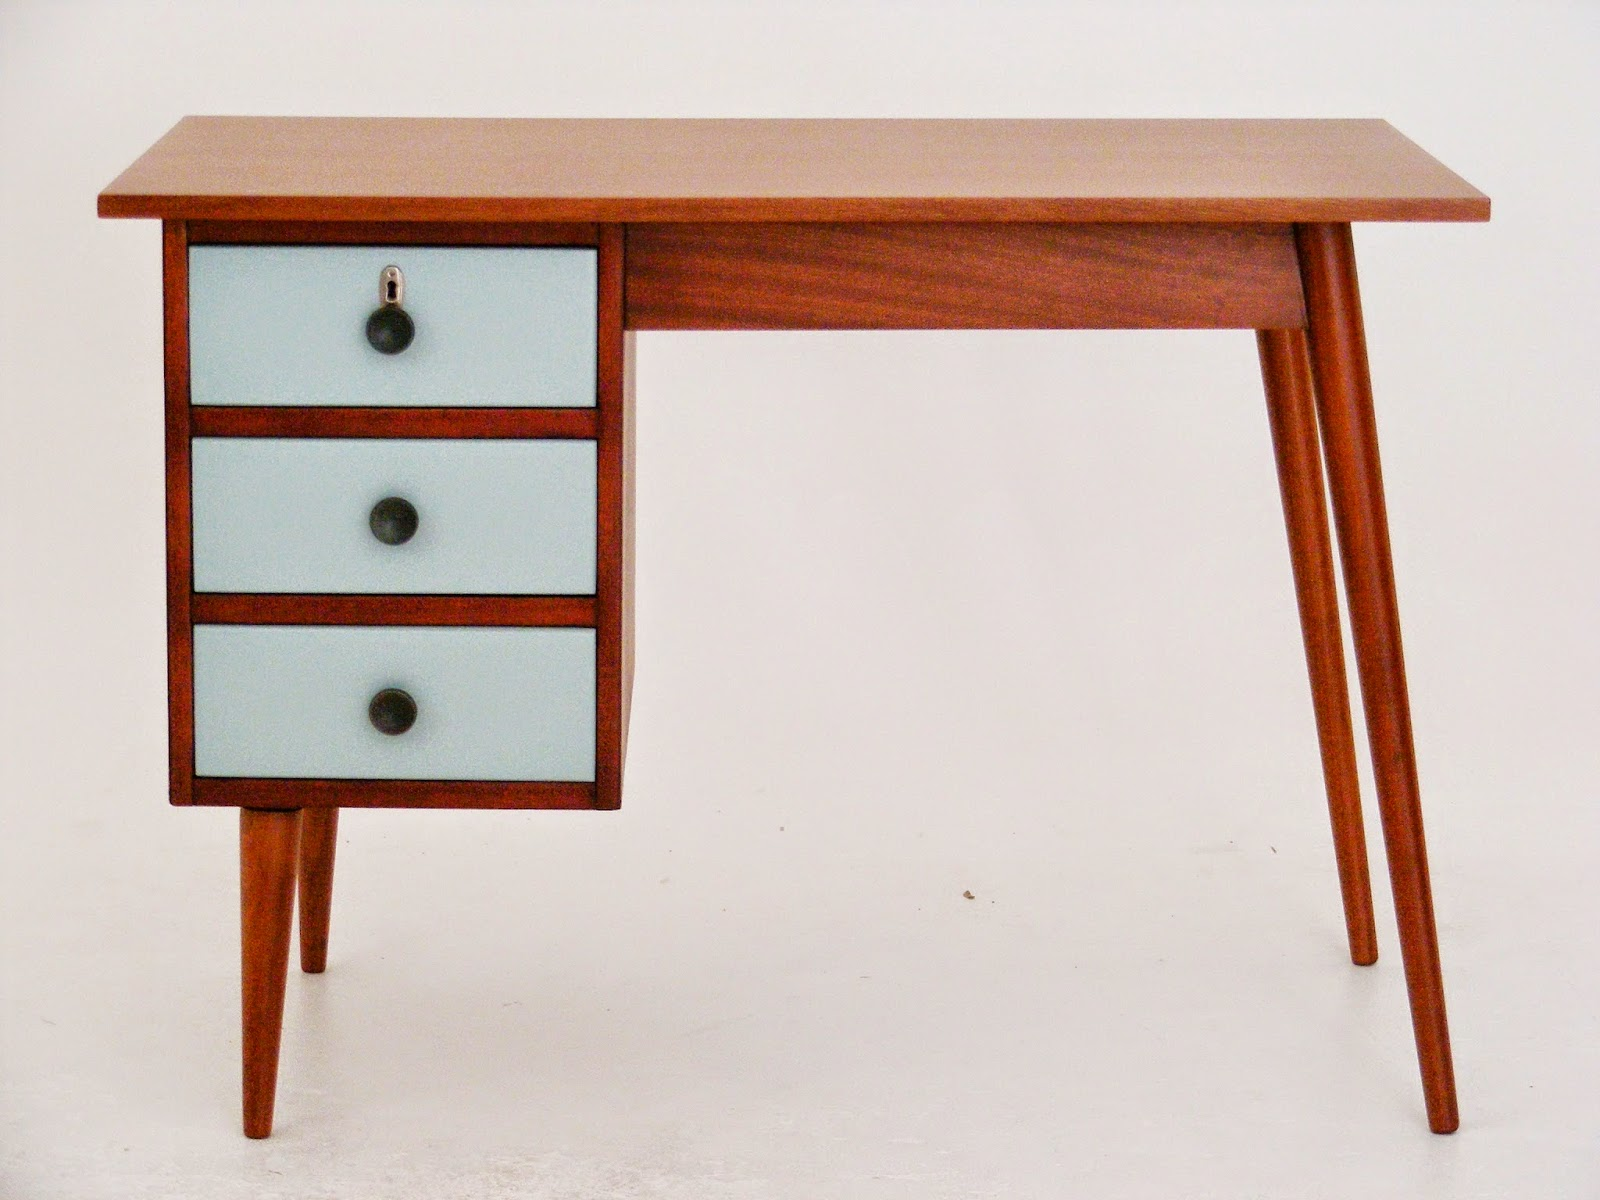 VAMP FURNITURE New vintage furniture stock at Vamp 27